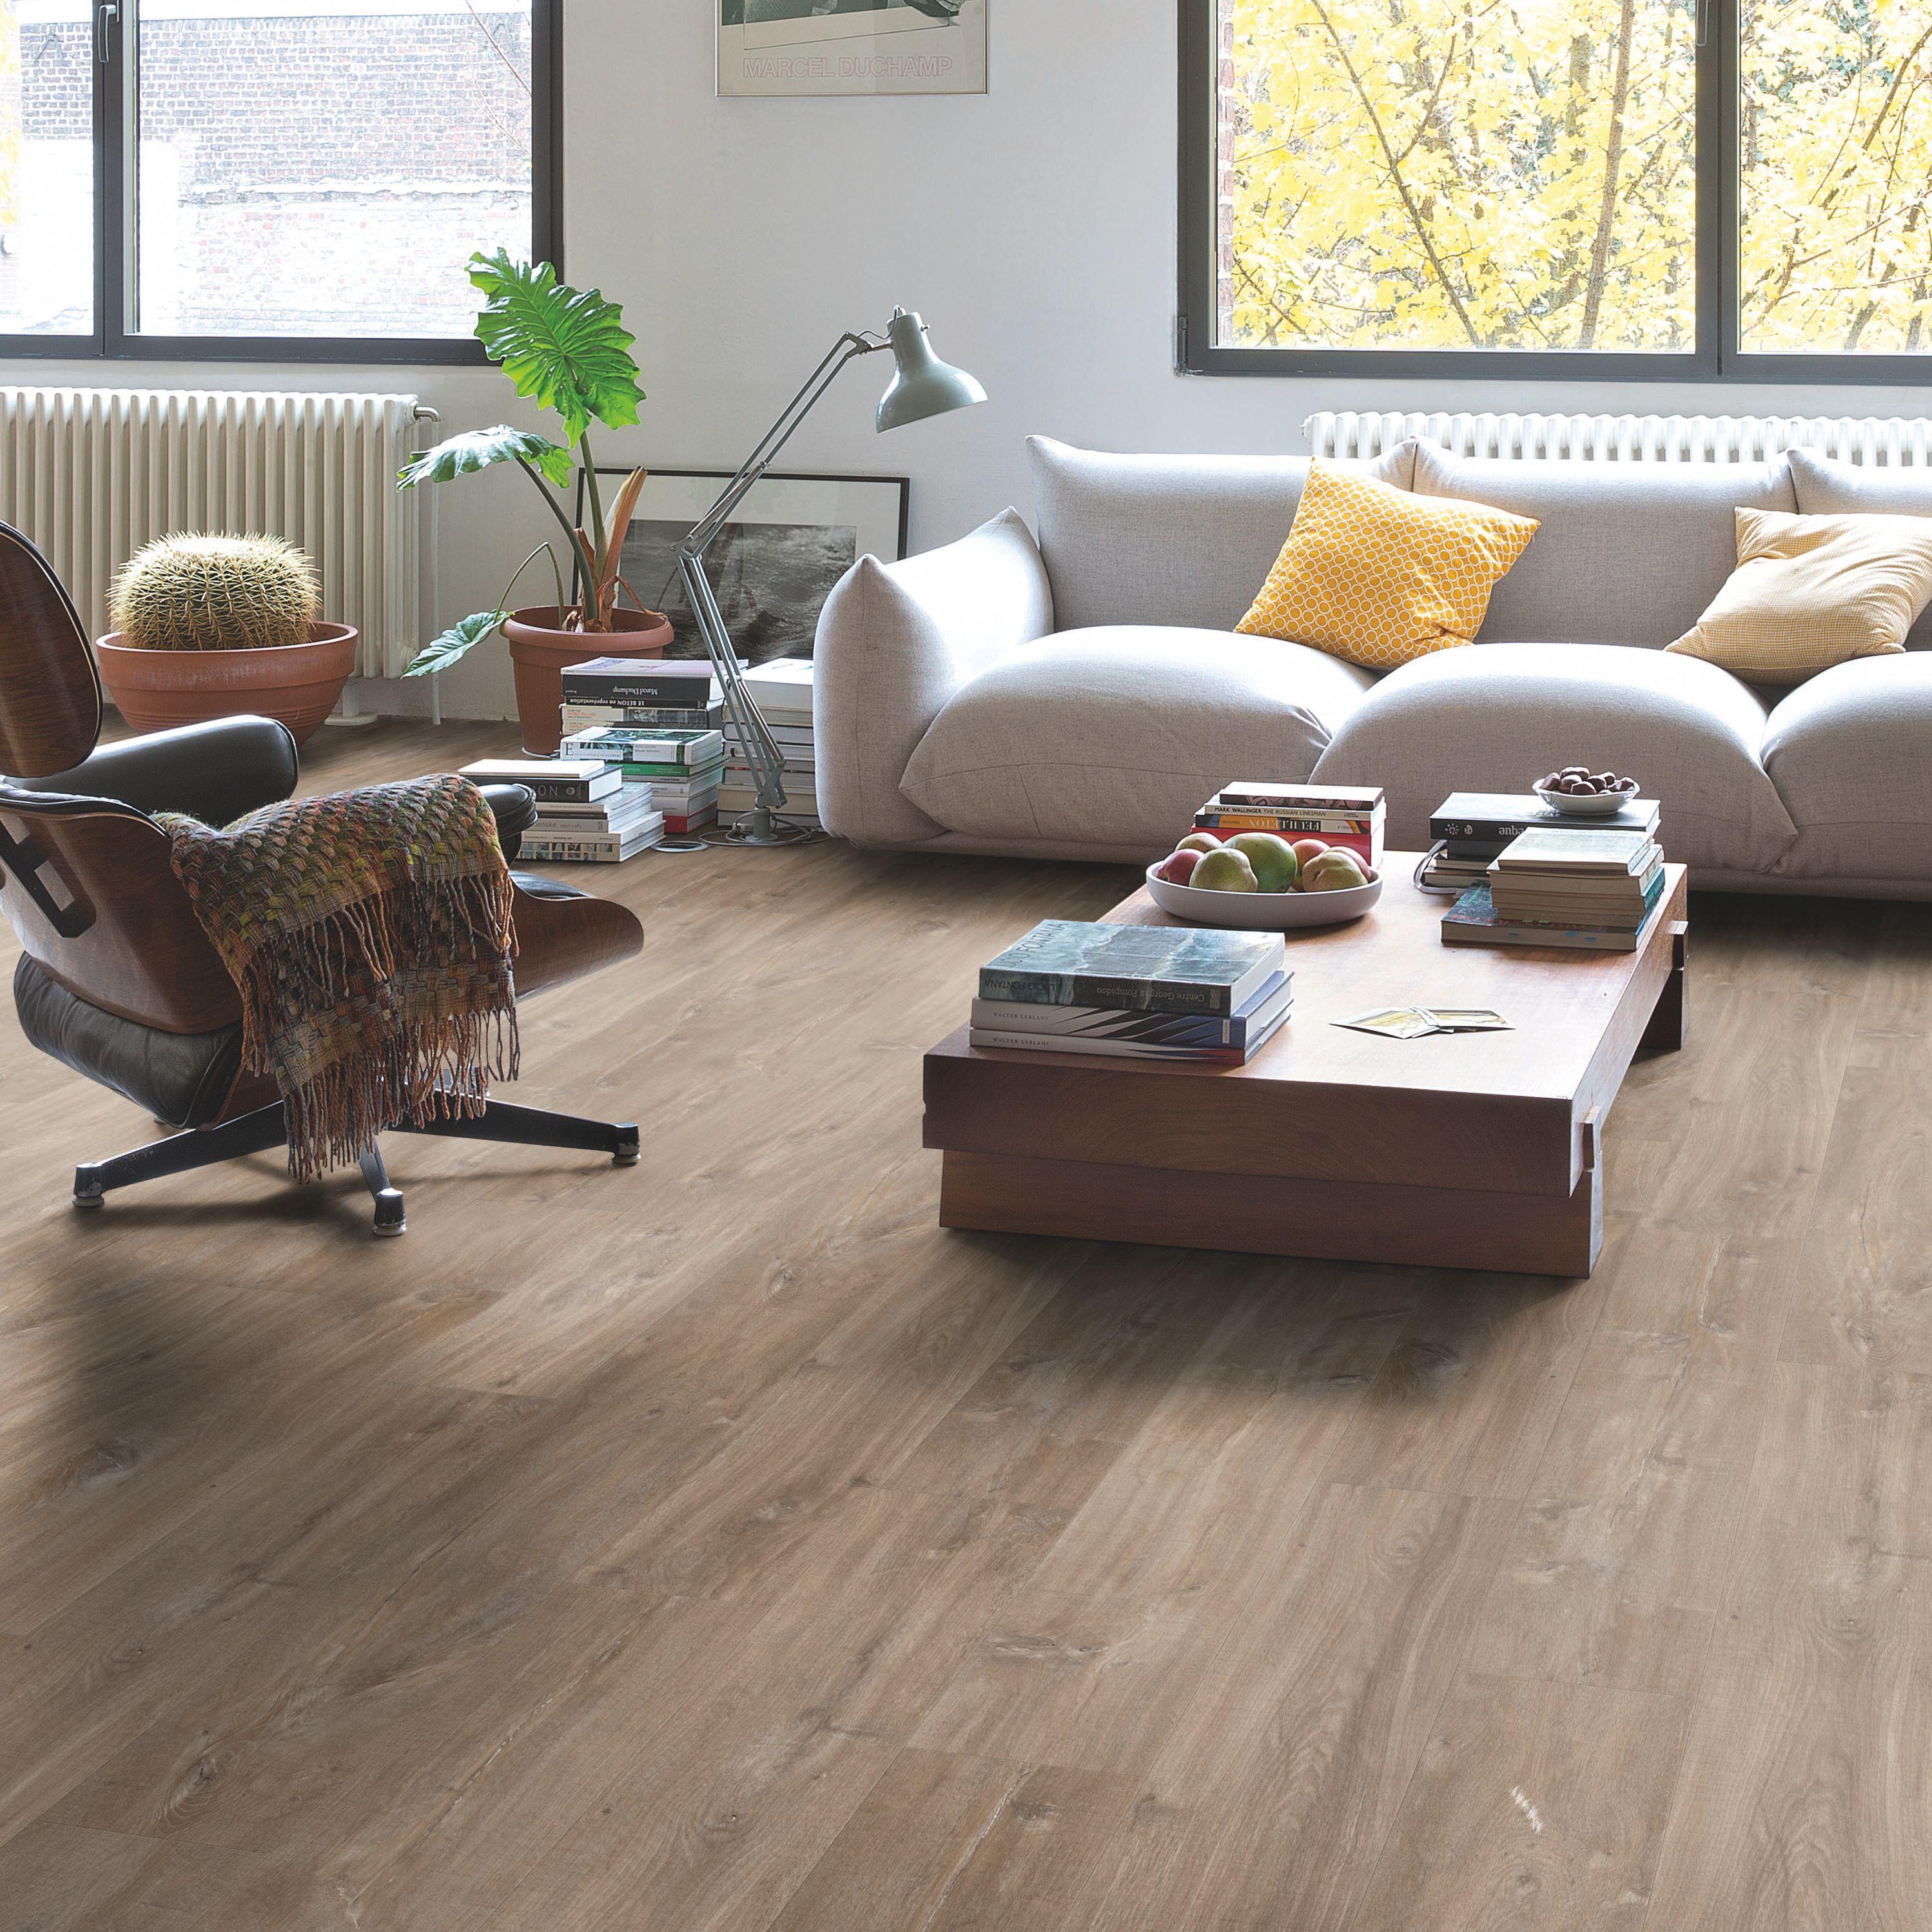 Step paso oak effect waterproof luxury vinyl flooring tile 2105 m paso oak effect waterproof luxury vinyl flooring tile 2105 m pack departments diy at dailygadgetfo Choice Image